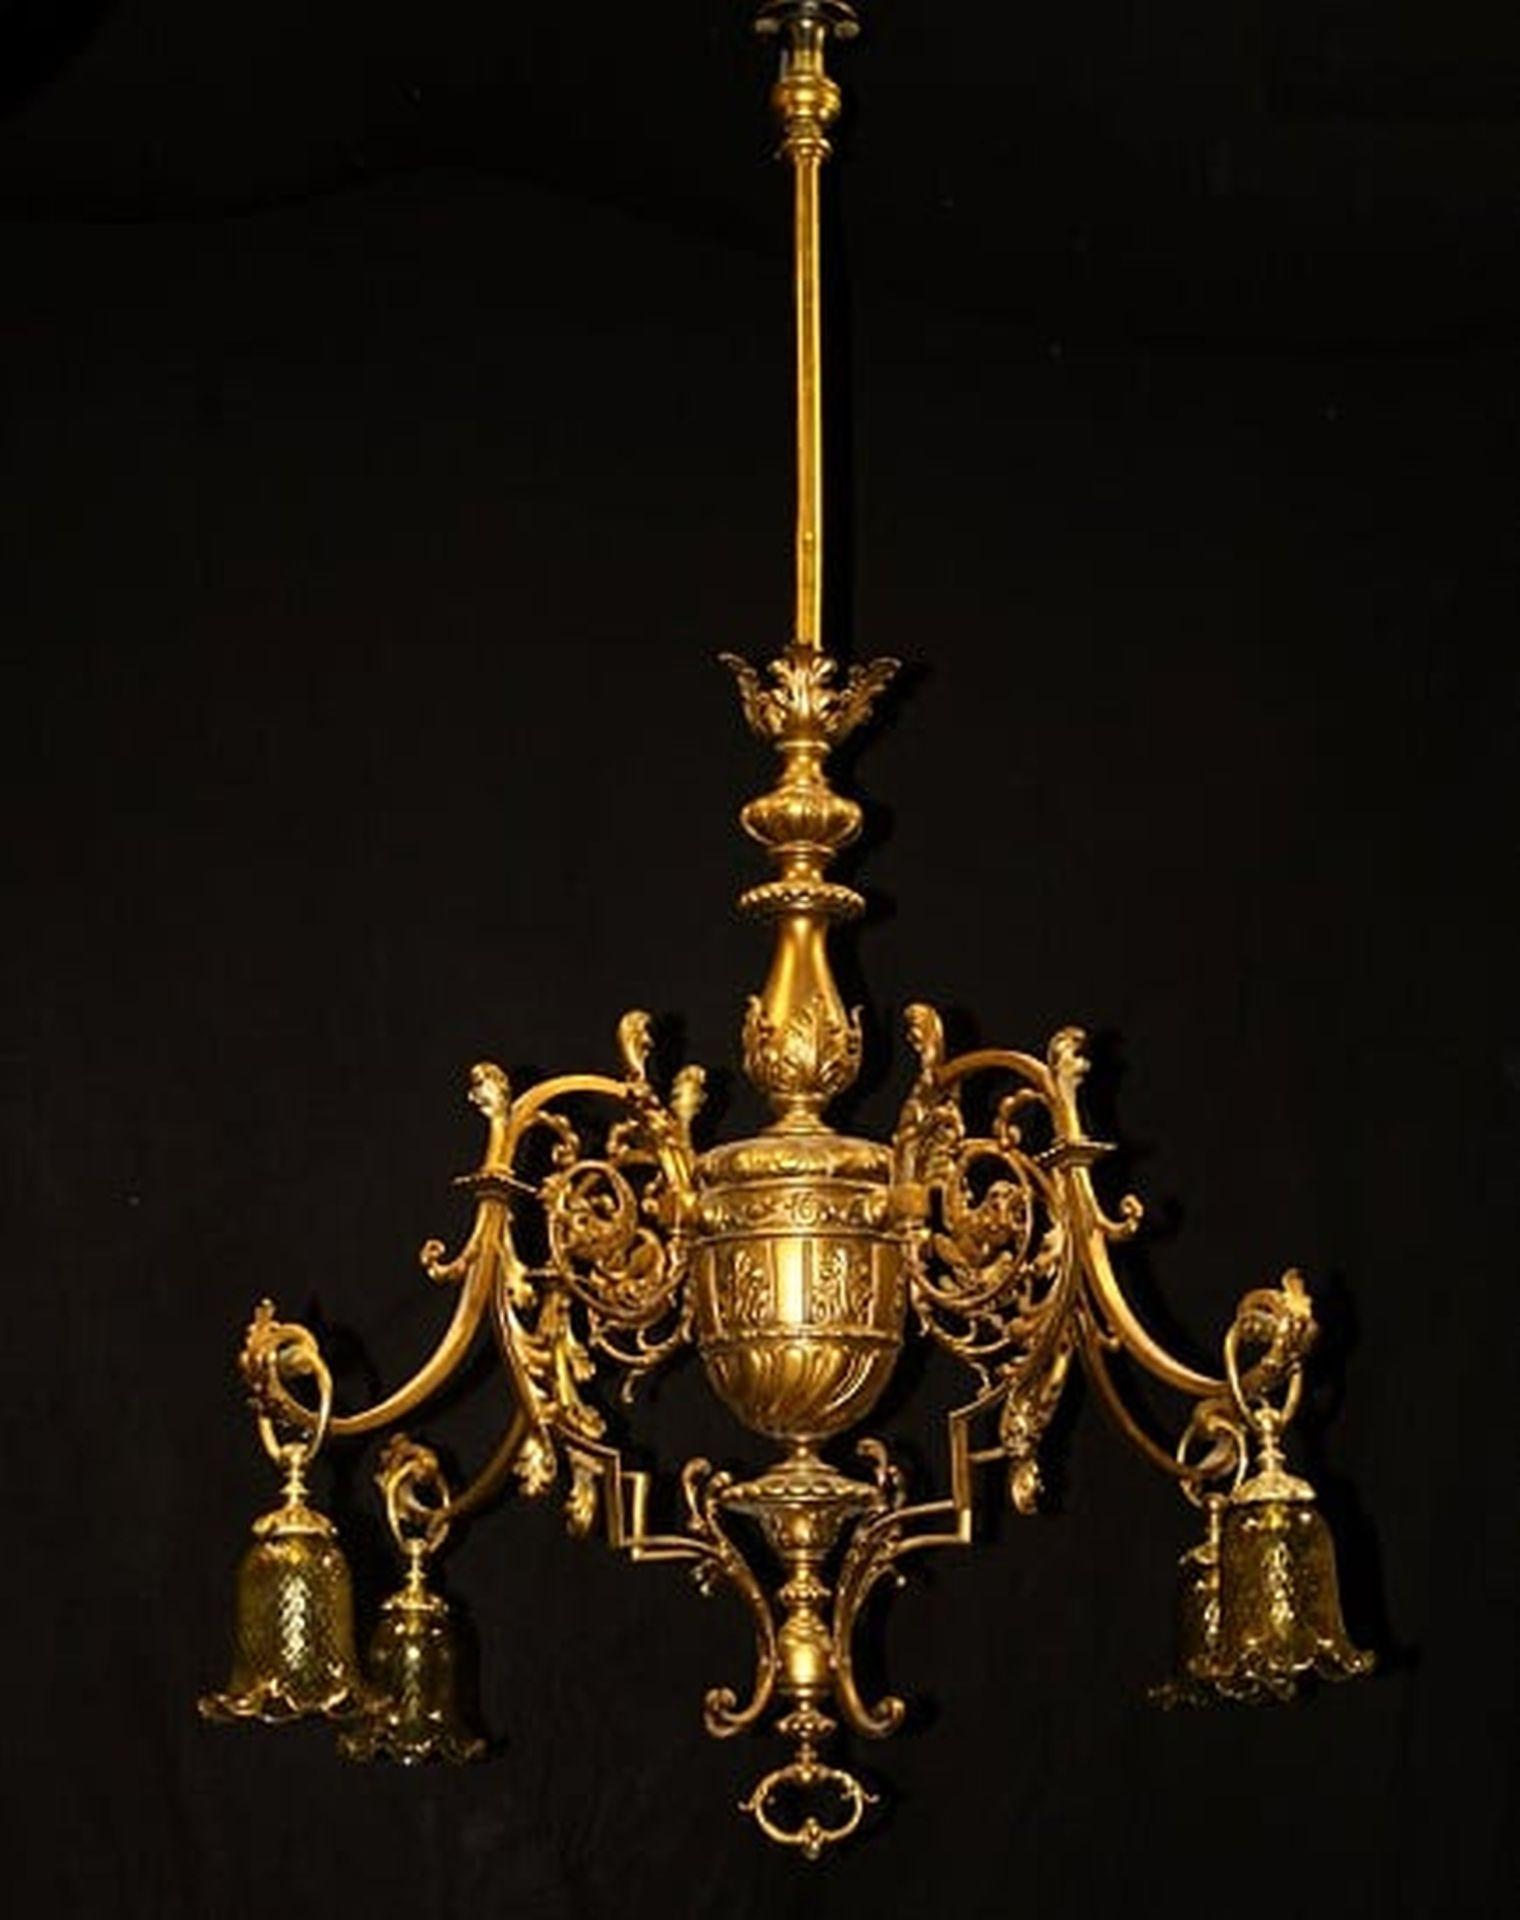 Los 228 - A late 19th century gilt bronze four light gasolier